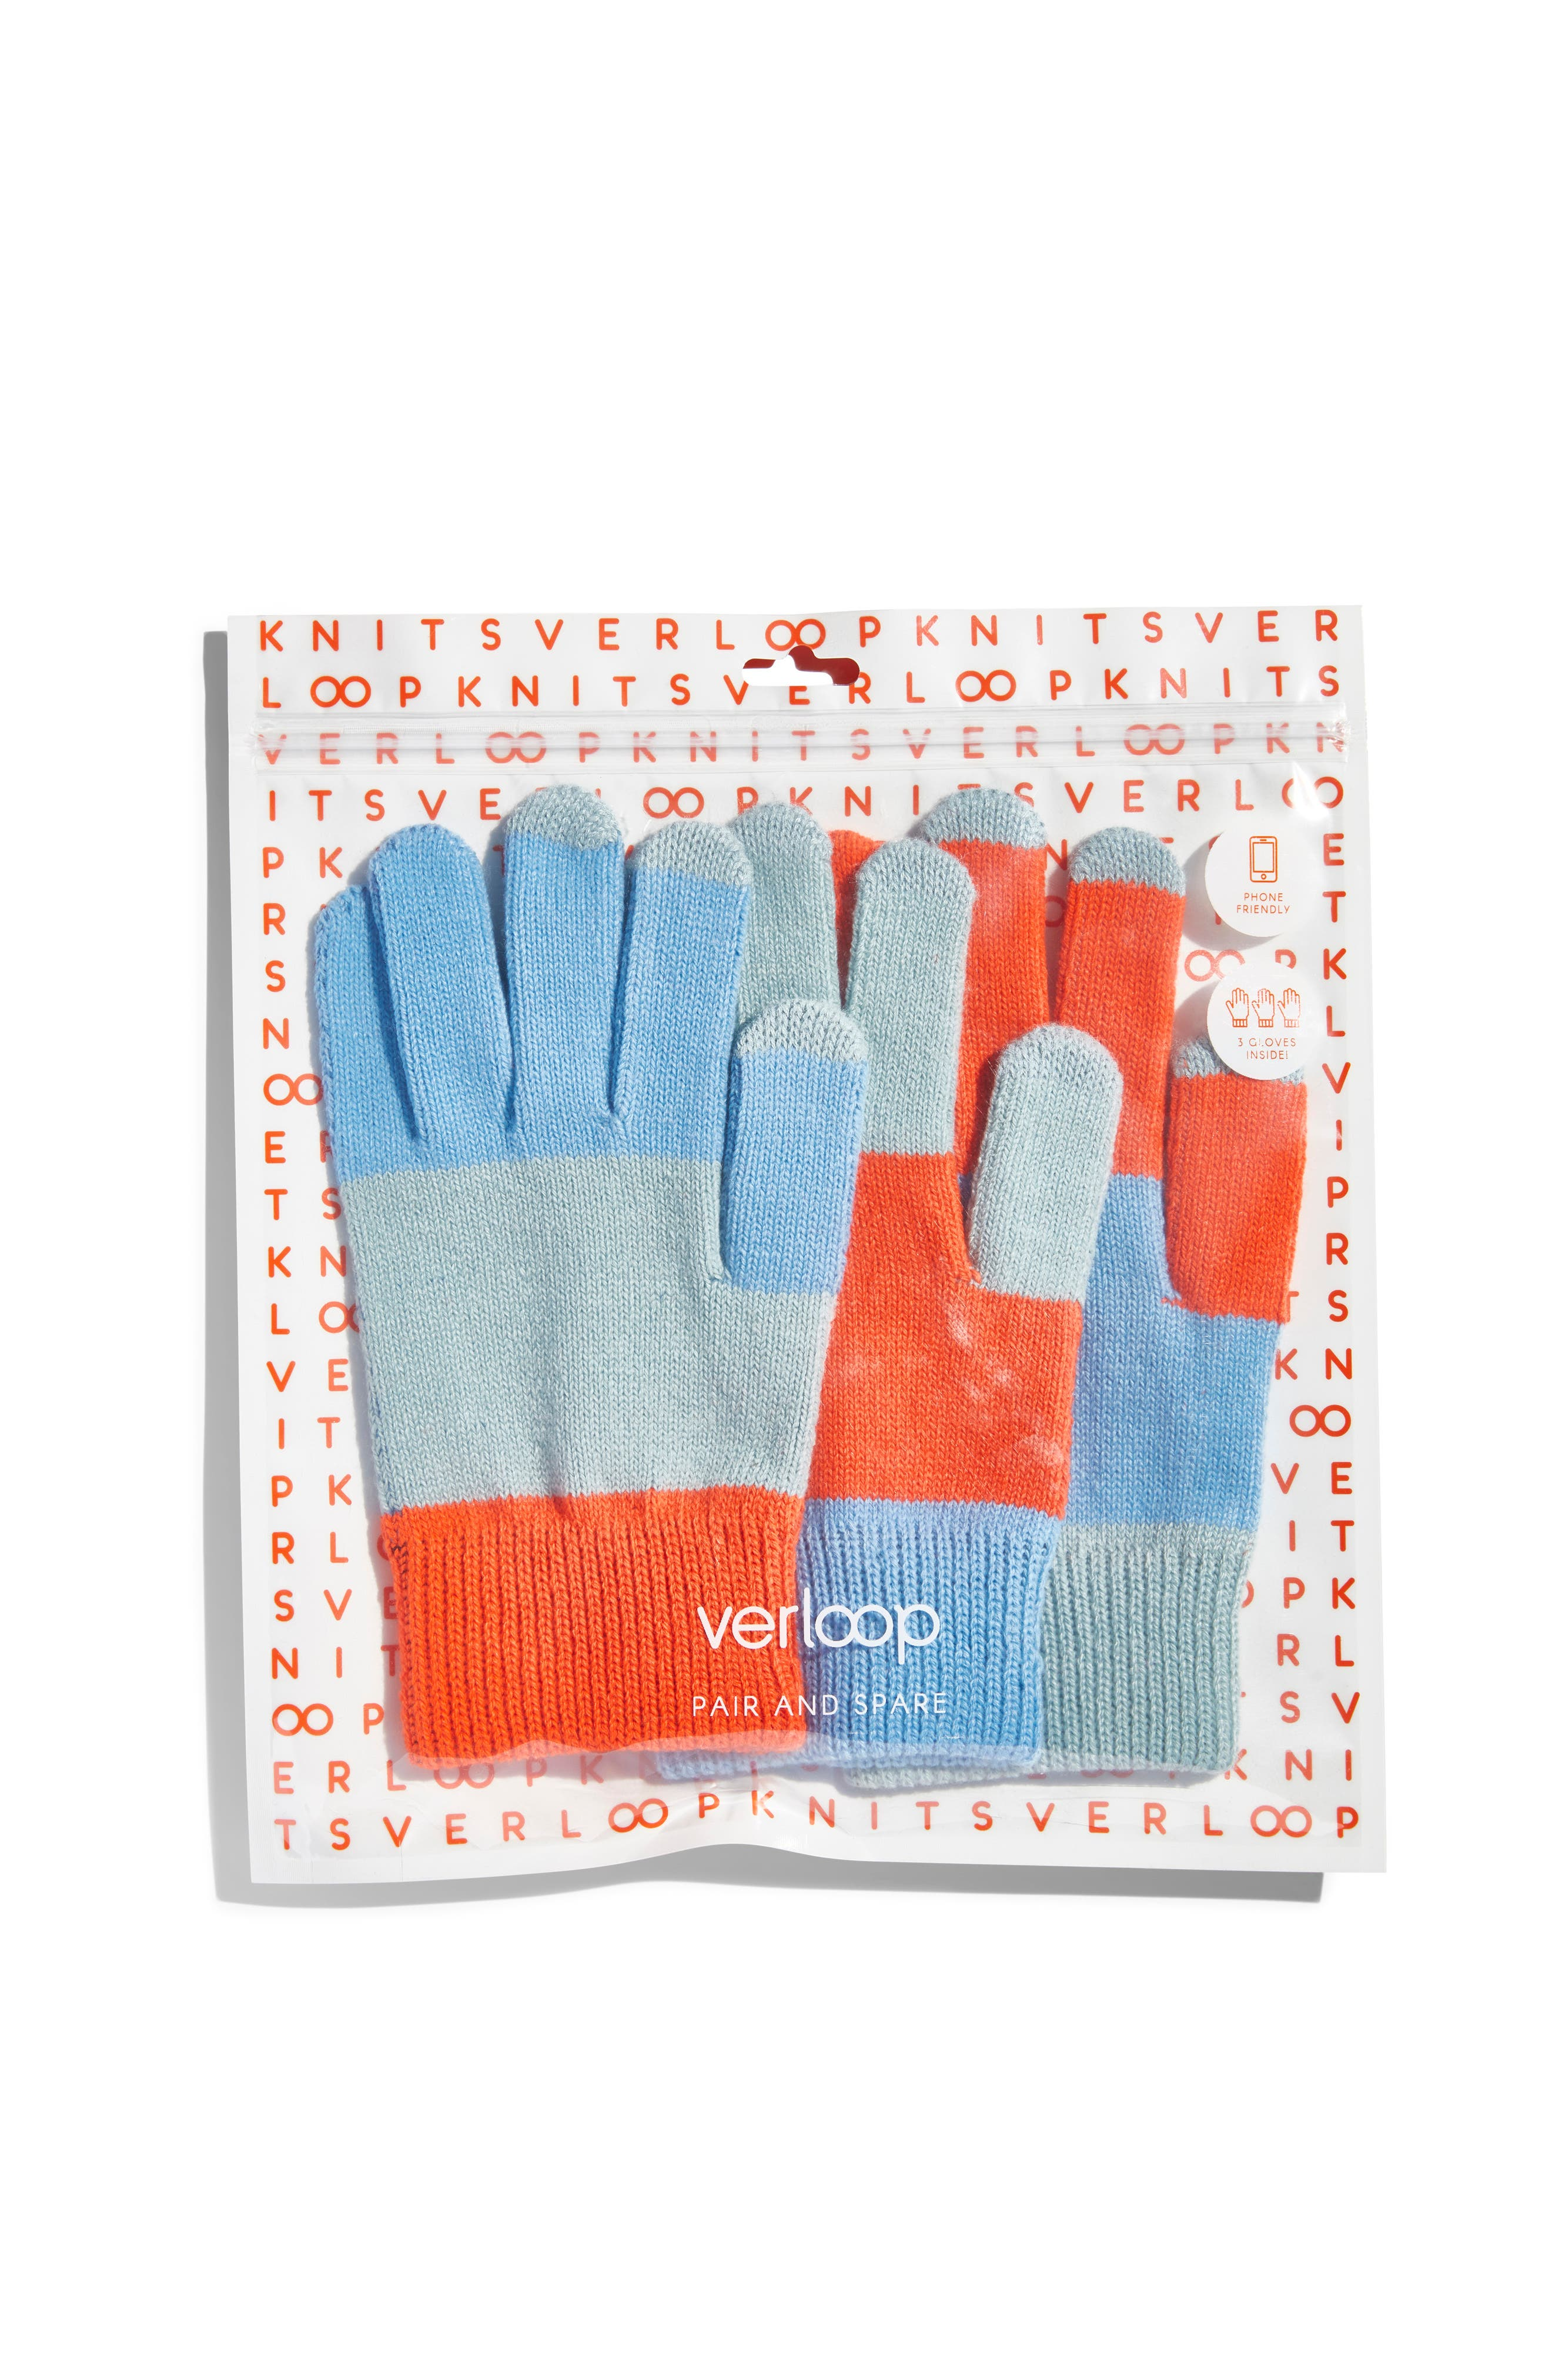 Pair & Spare Set of 3 Touchscreen Gloves,                             Alternate thumbnail 3, color,                             BLUES ORANGE